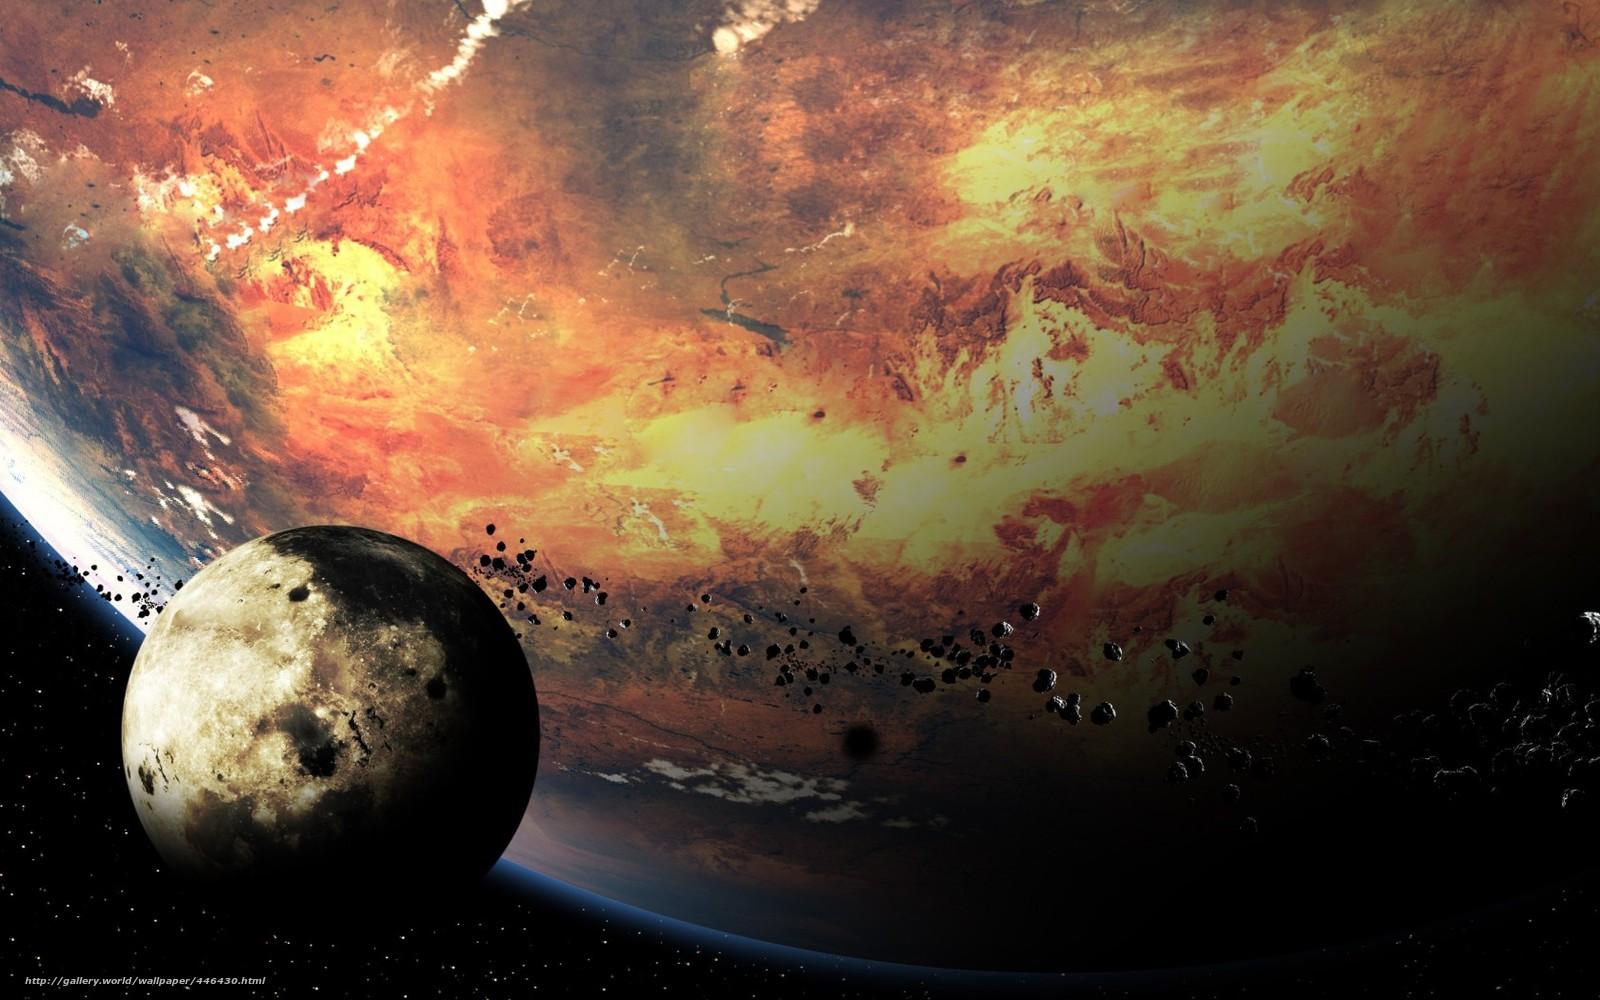 Скачать на телефон обои фото картинку на тему планета, спутник, метеориты, камни, разширение 1680x1050